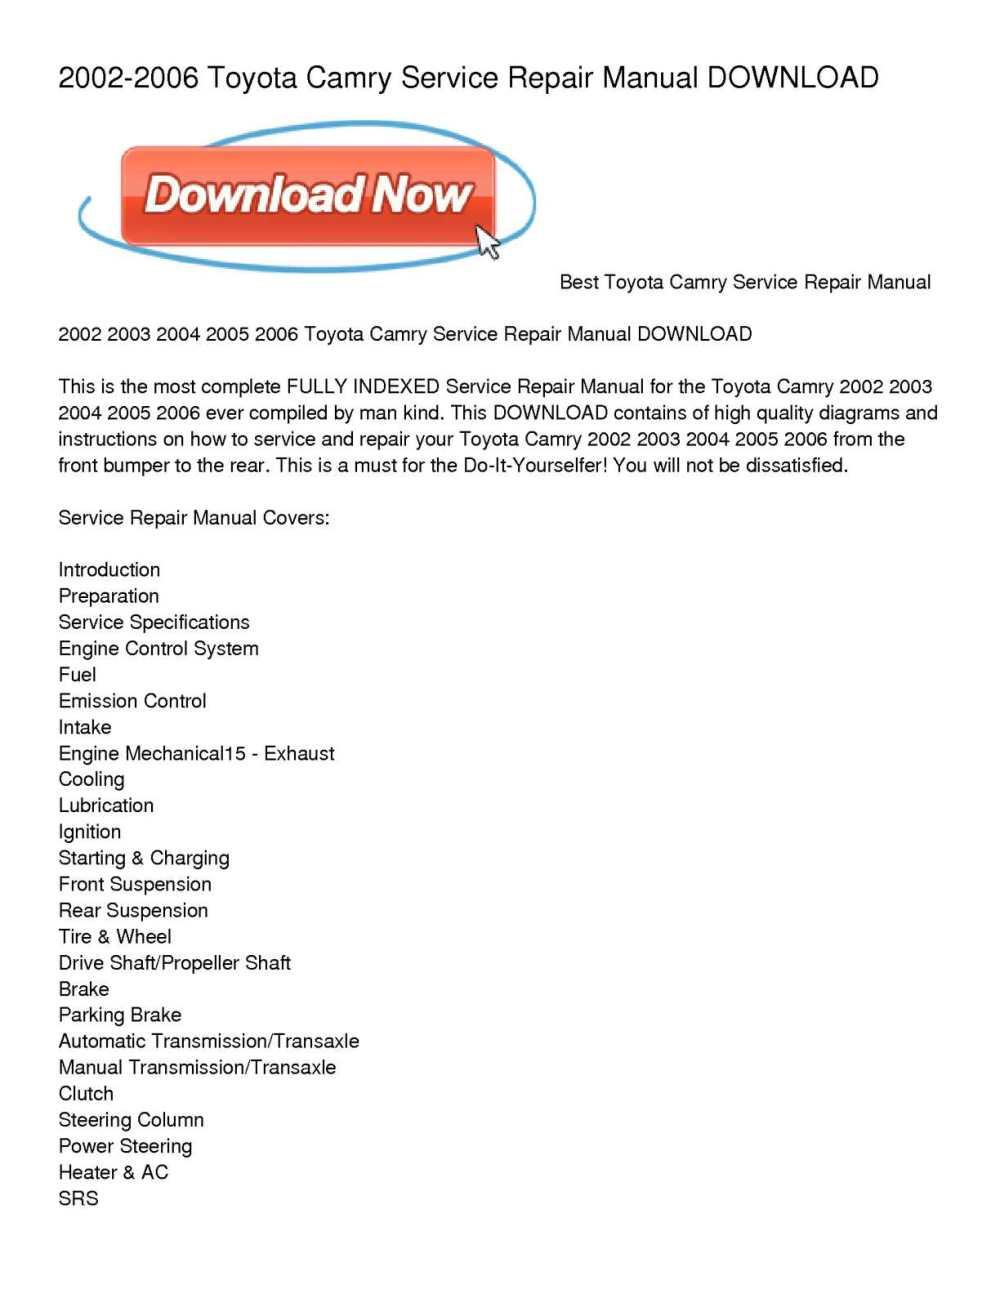 medium resolution of 2002 2006 toyota camry service repair manual download